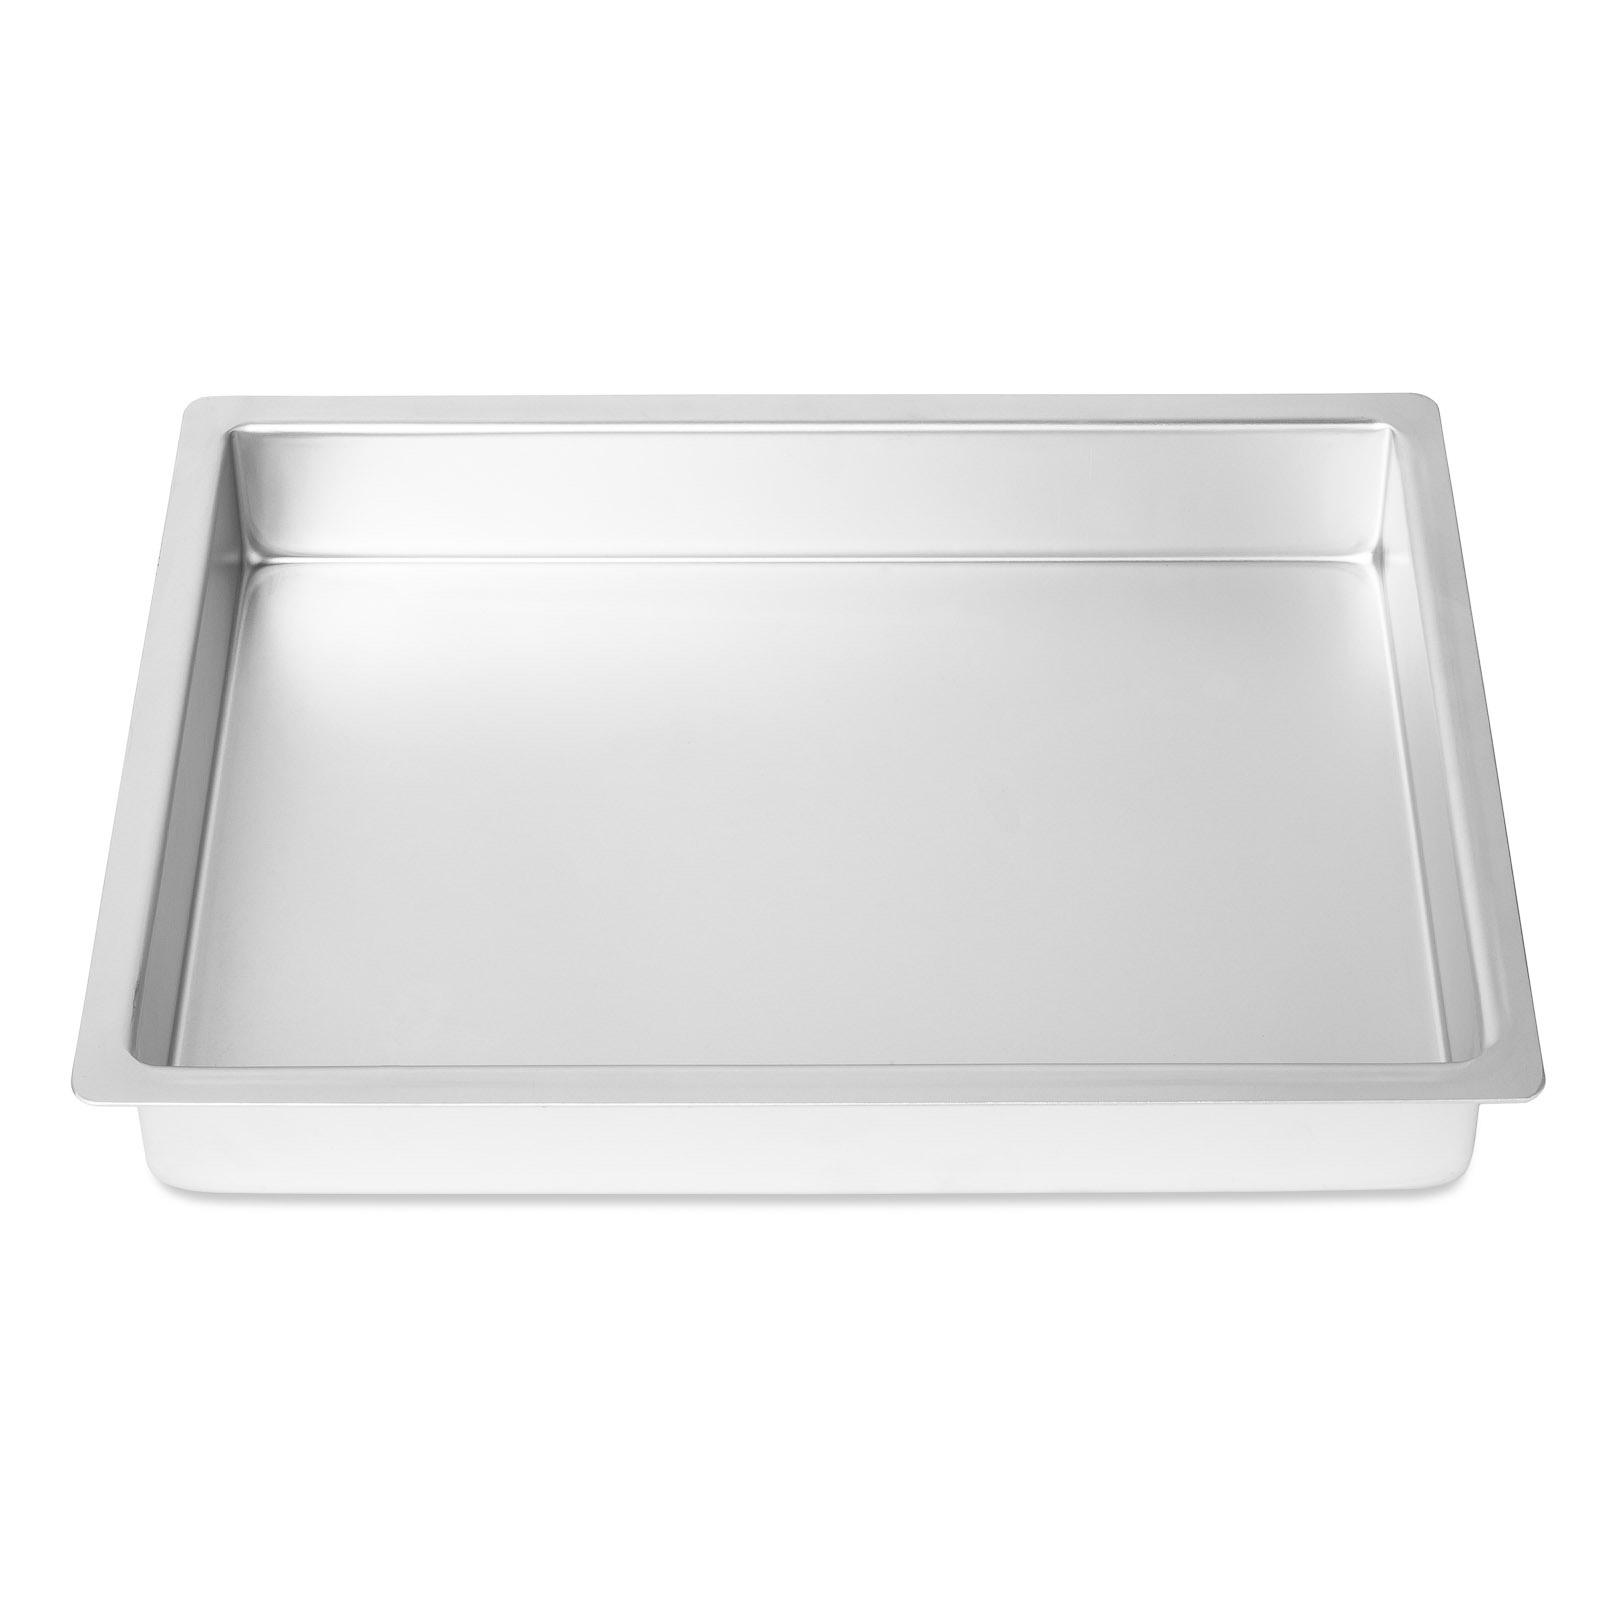 Details about Professional Rectangular Aluminum Sheet Cake Pan Baking Tin  (Assorted Sizes)